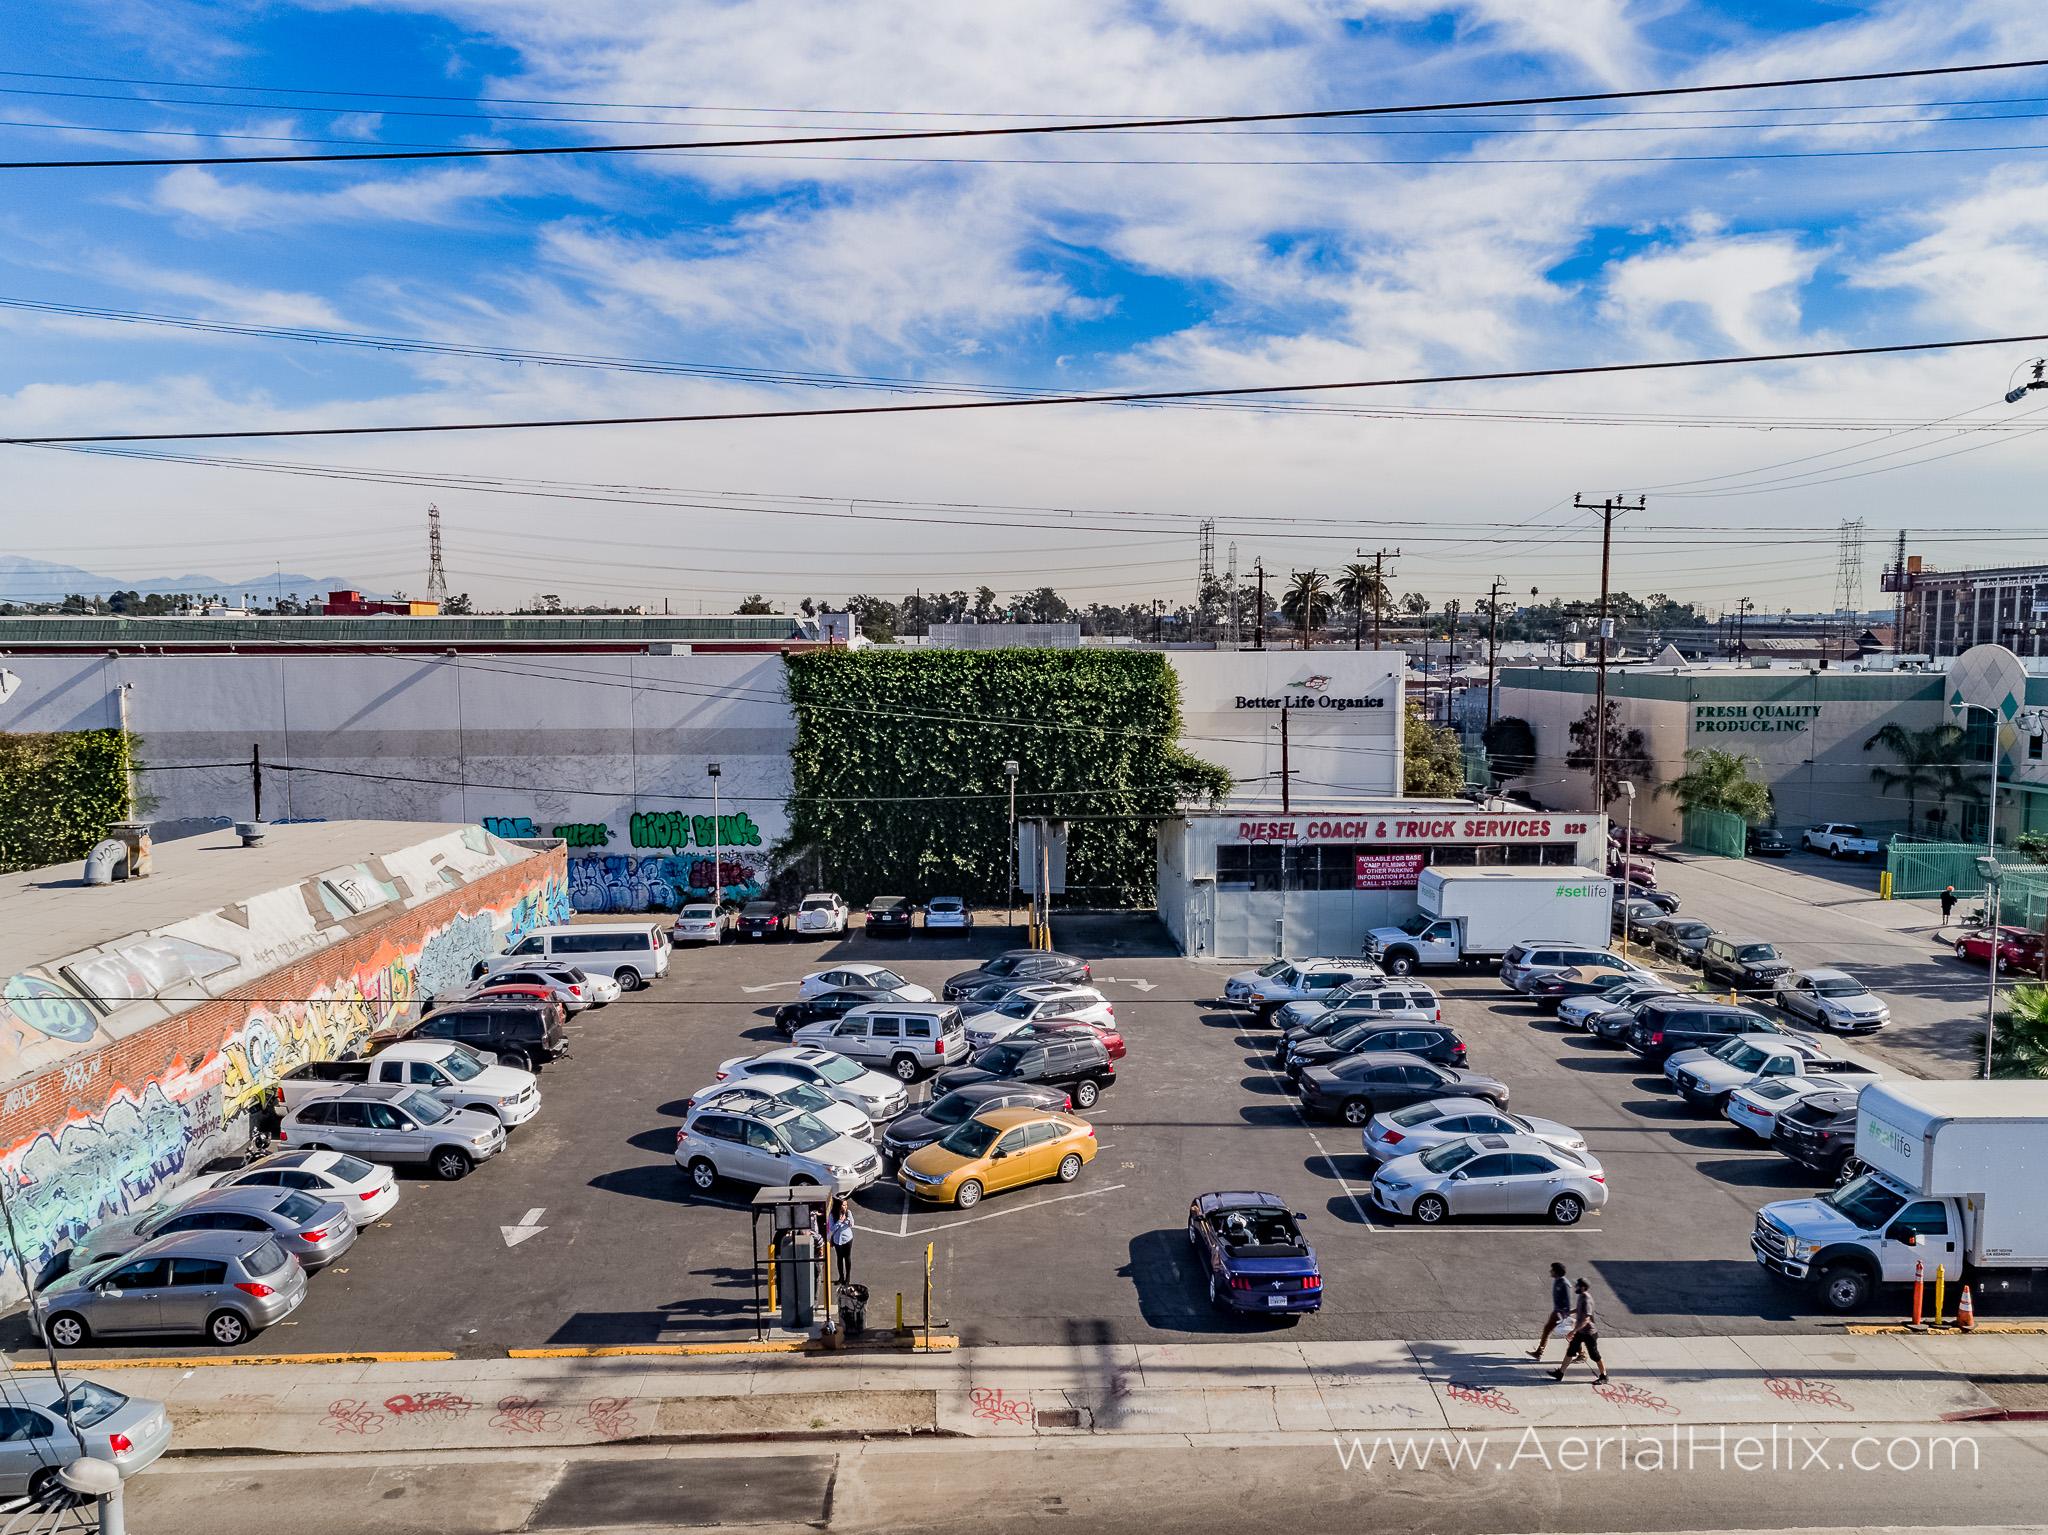 Perfect Parking 2 aerial photographer-26.jpg